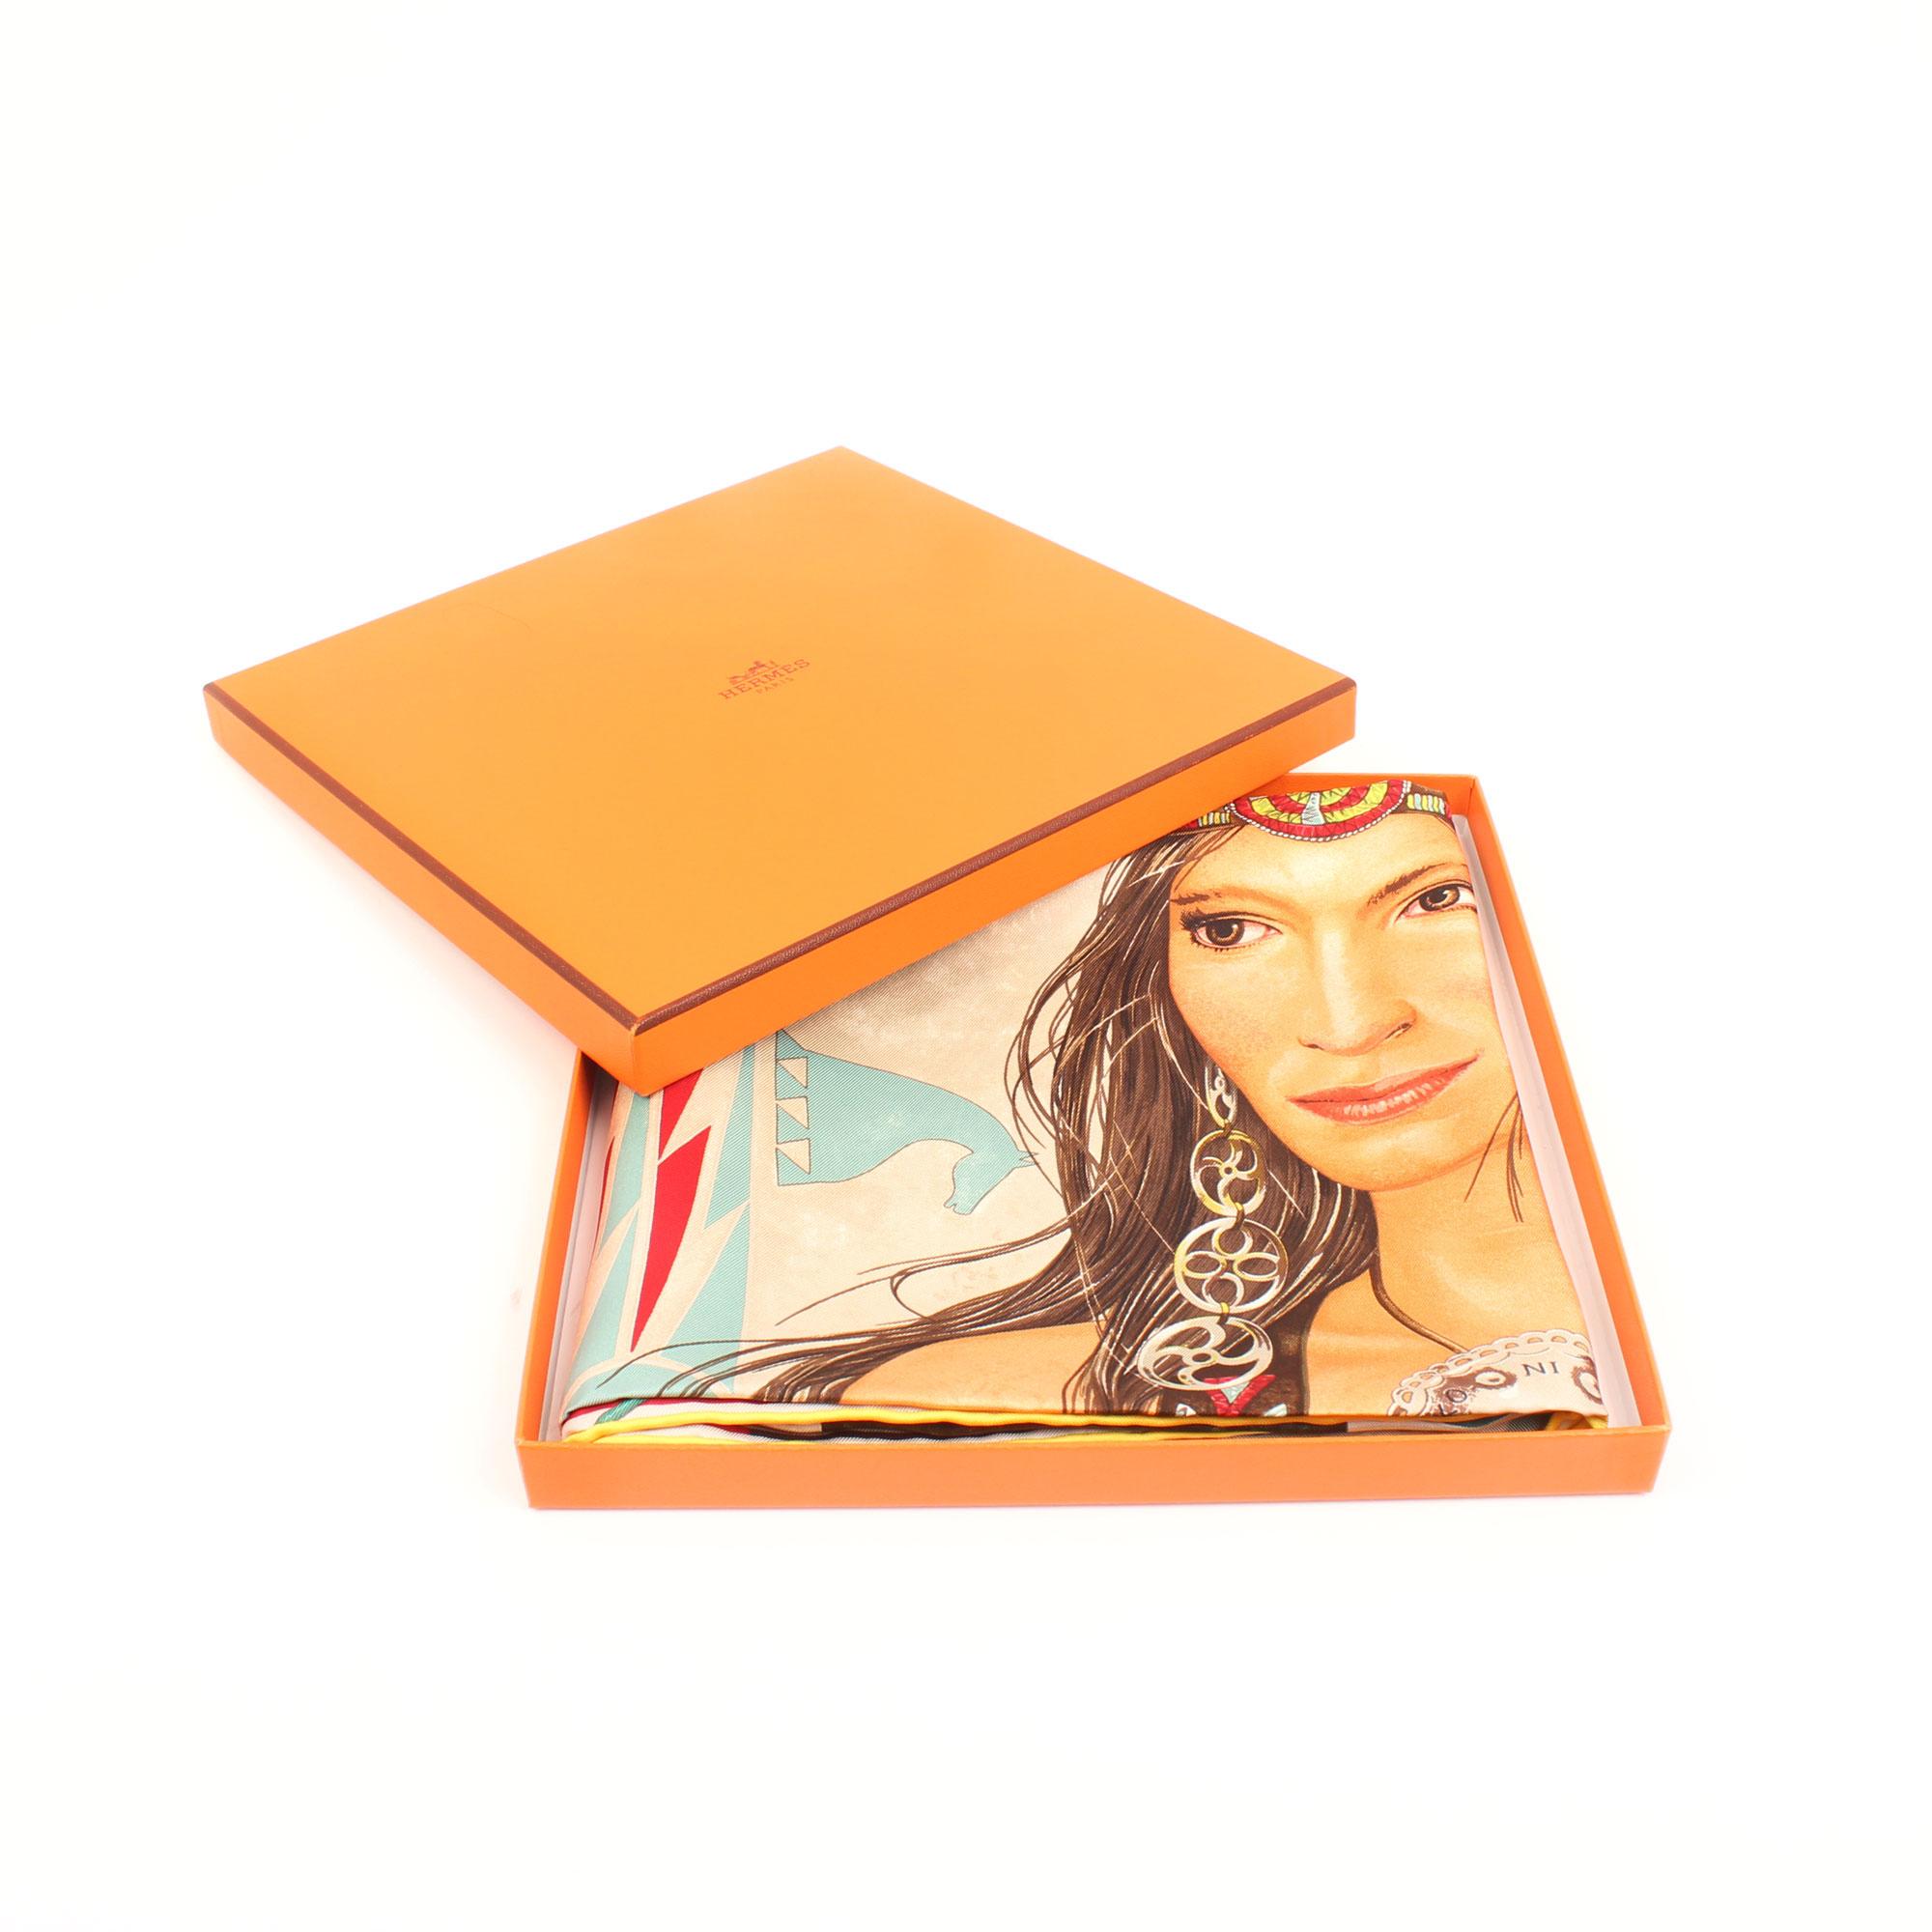 Imagen de la caja del carre de hermes princesa wakoni amarillo verde rojo